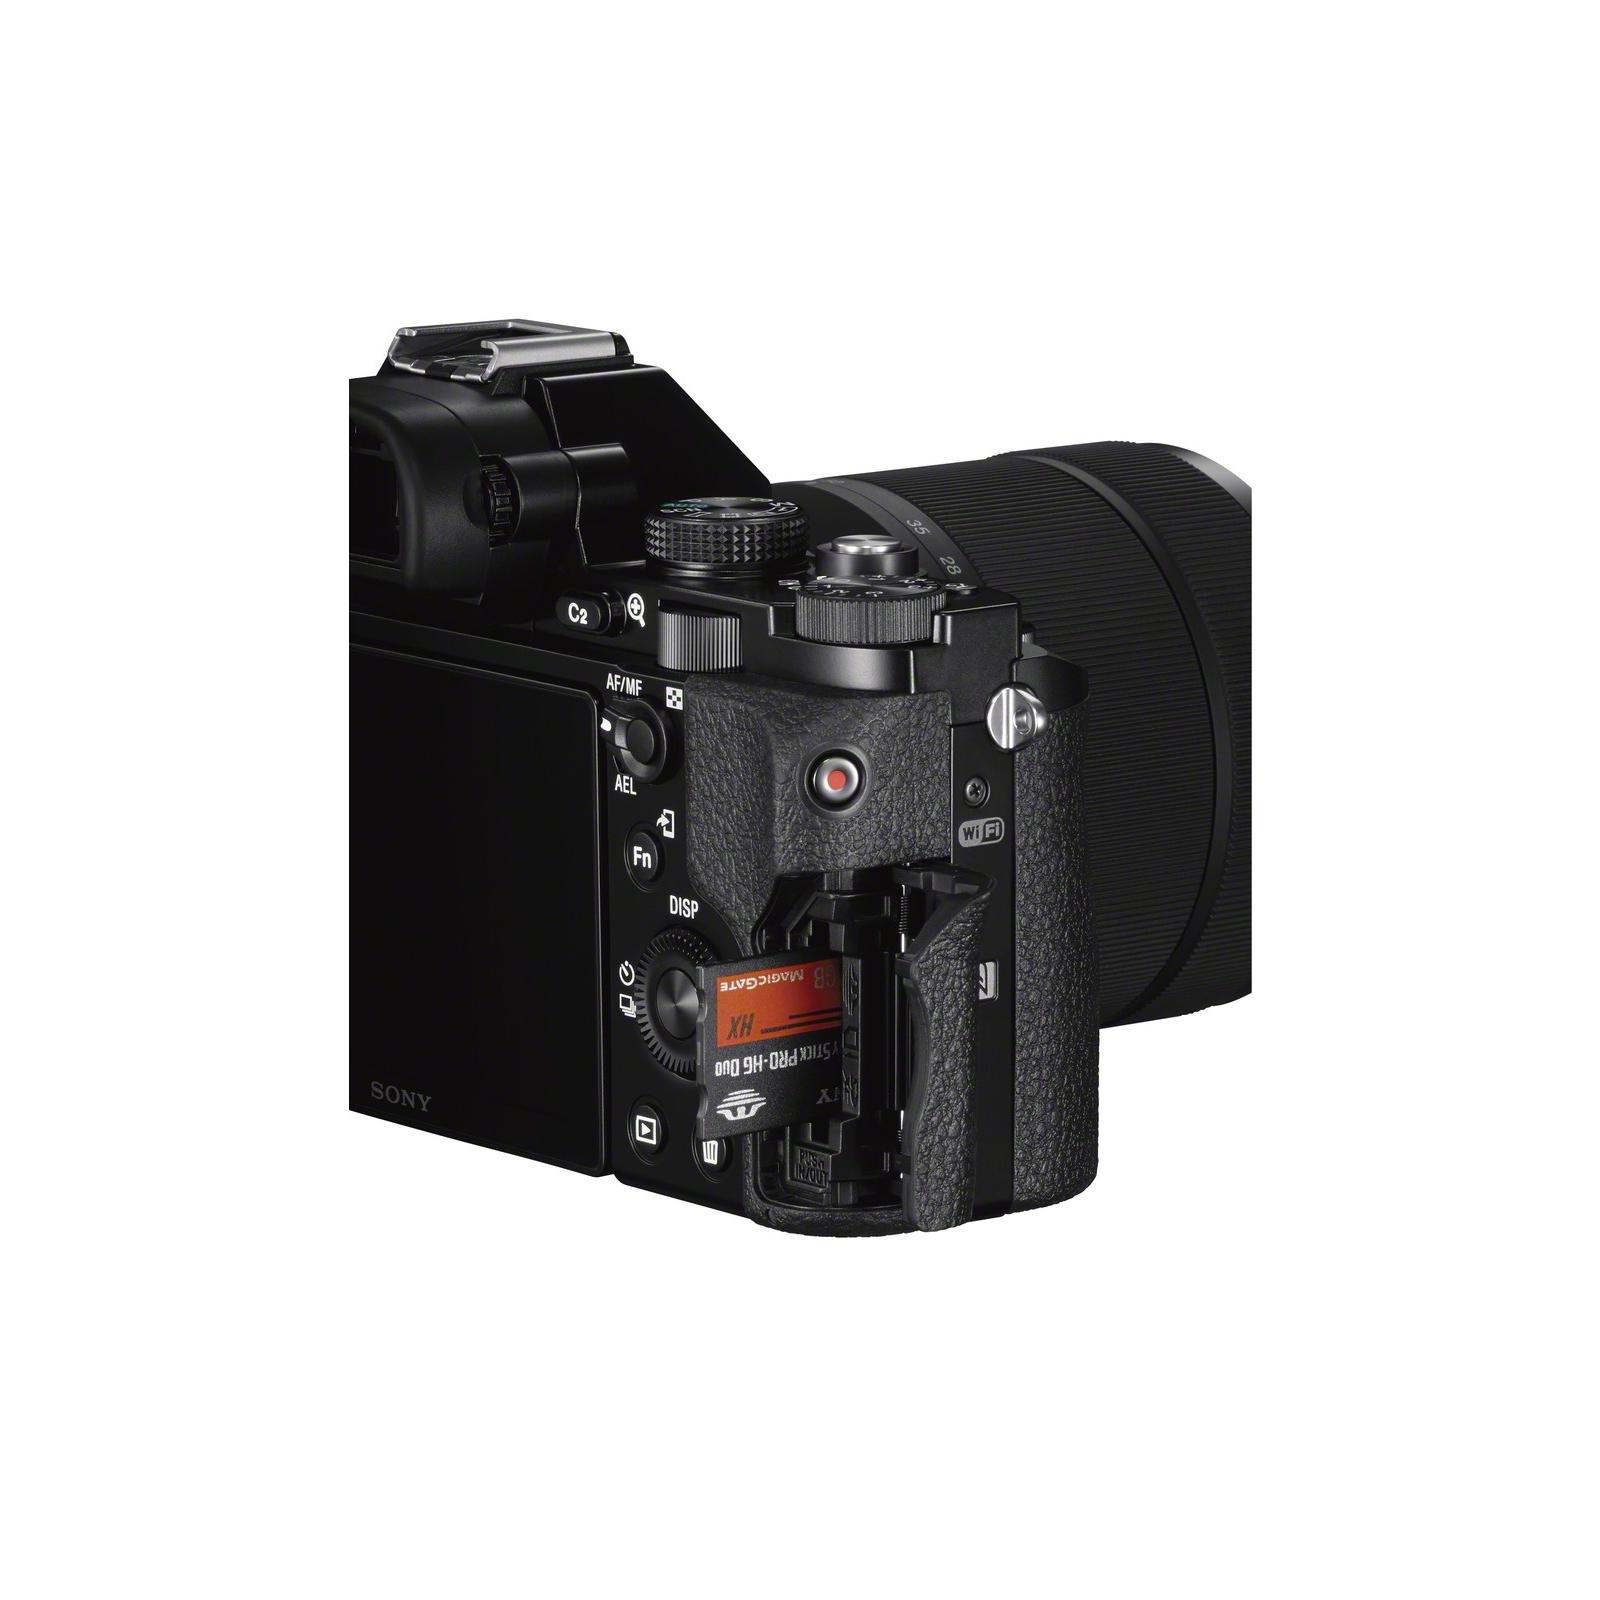 Цифровой фотоаппарат SONY Alpha 7 28-70 kit black (ILCE7KB.RU2) изображение 9